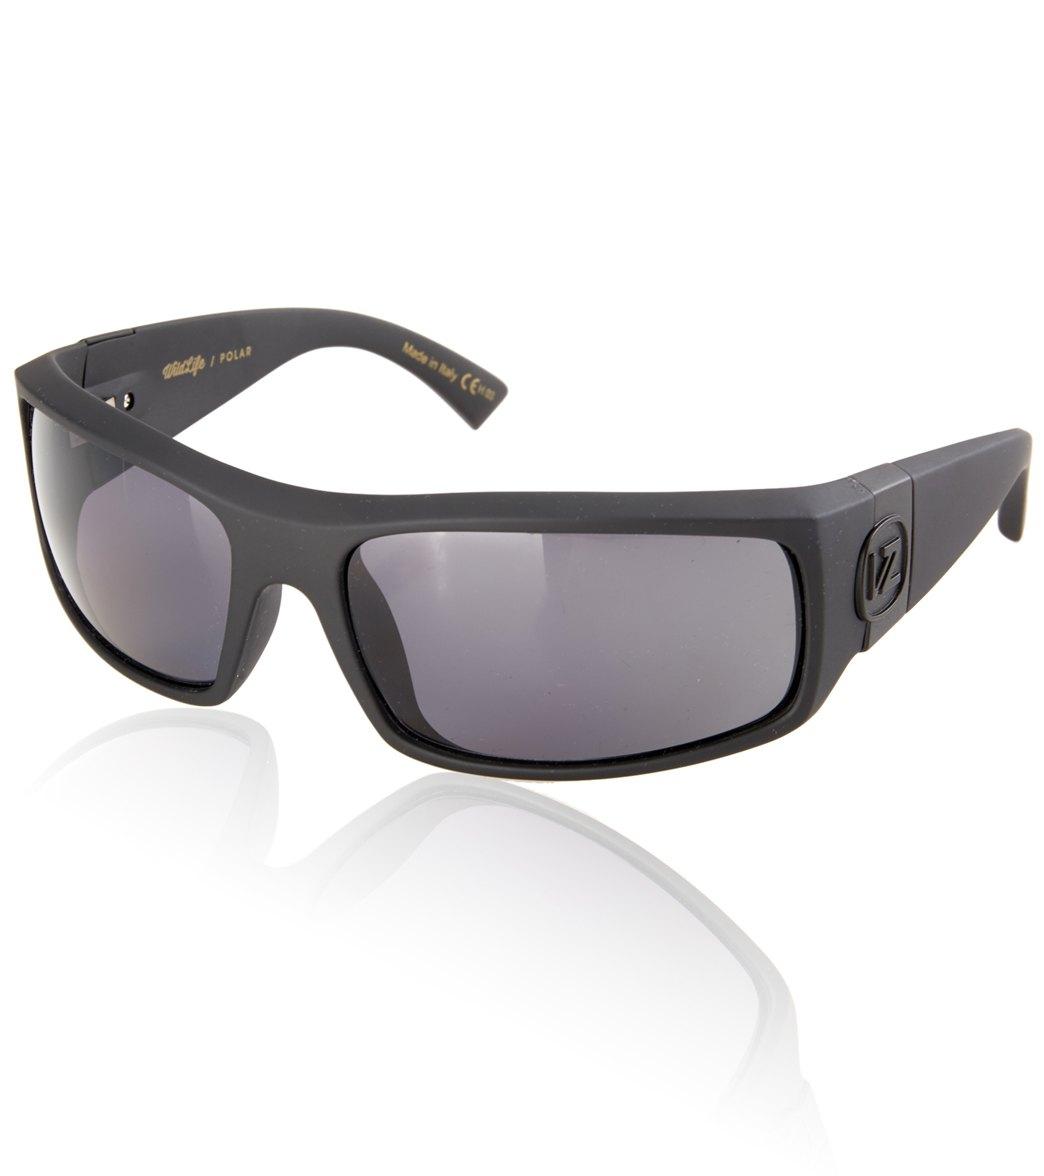 ddde9dbf24 Share. Share on Facebook · Tweet on Twitter · Pin on Pinterest. Visit  Product Page close X. Von Zipper Kickstand Polarized Sunglasses